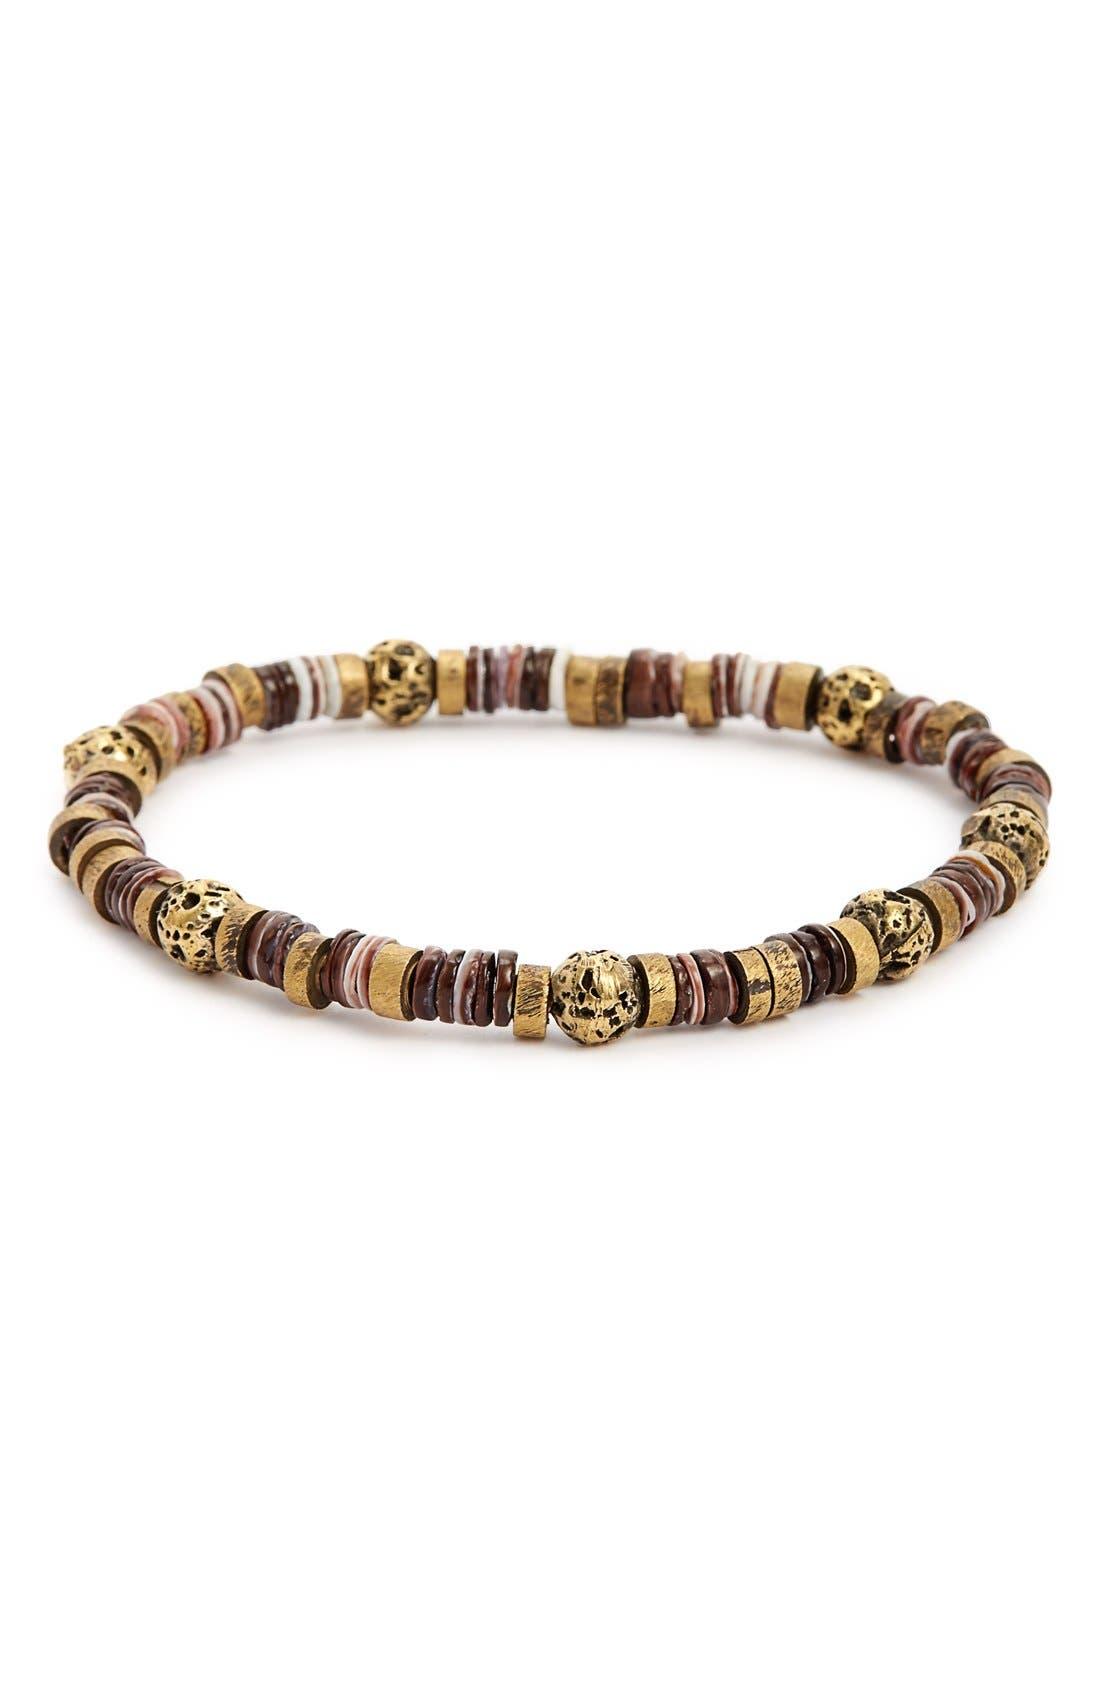 Lava Rock & Brass Bead Bracelet,                         Main,                         color, Brown